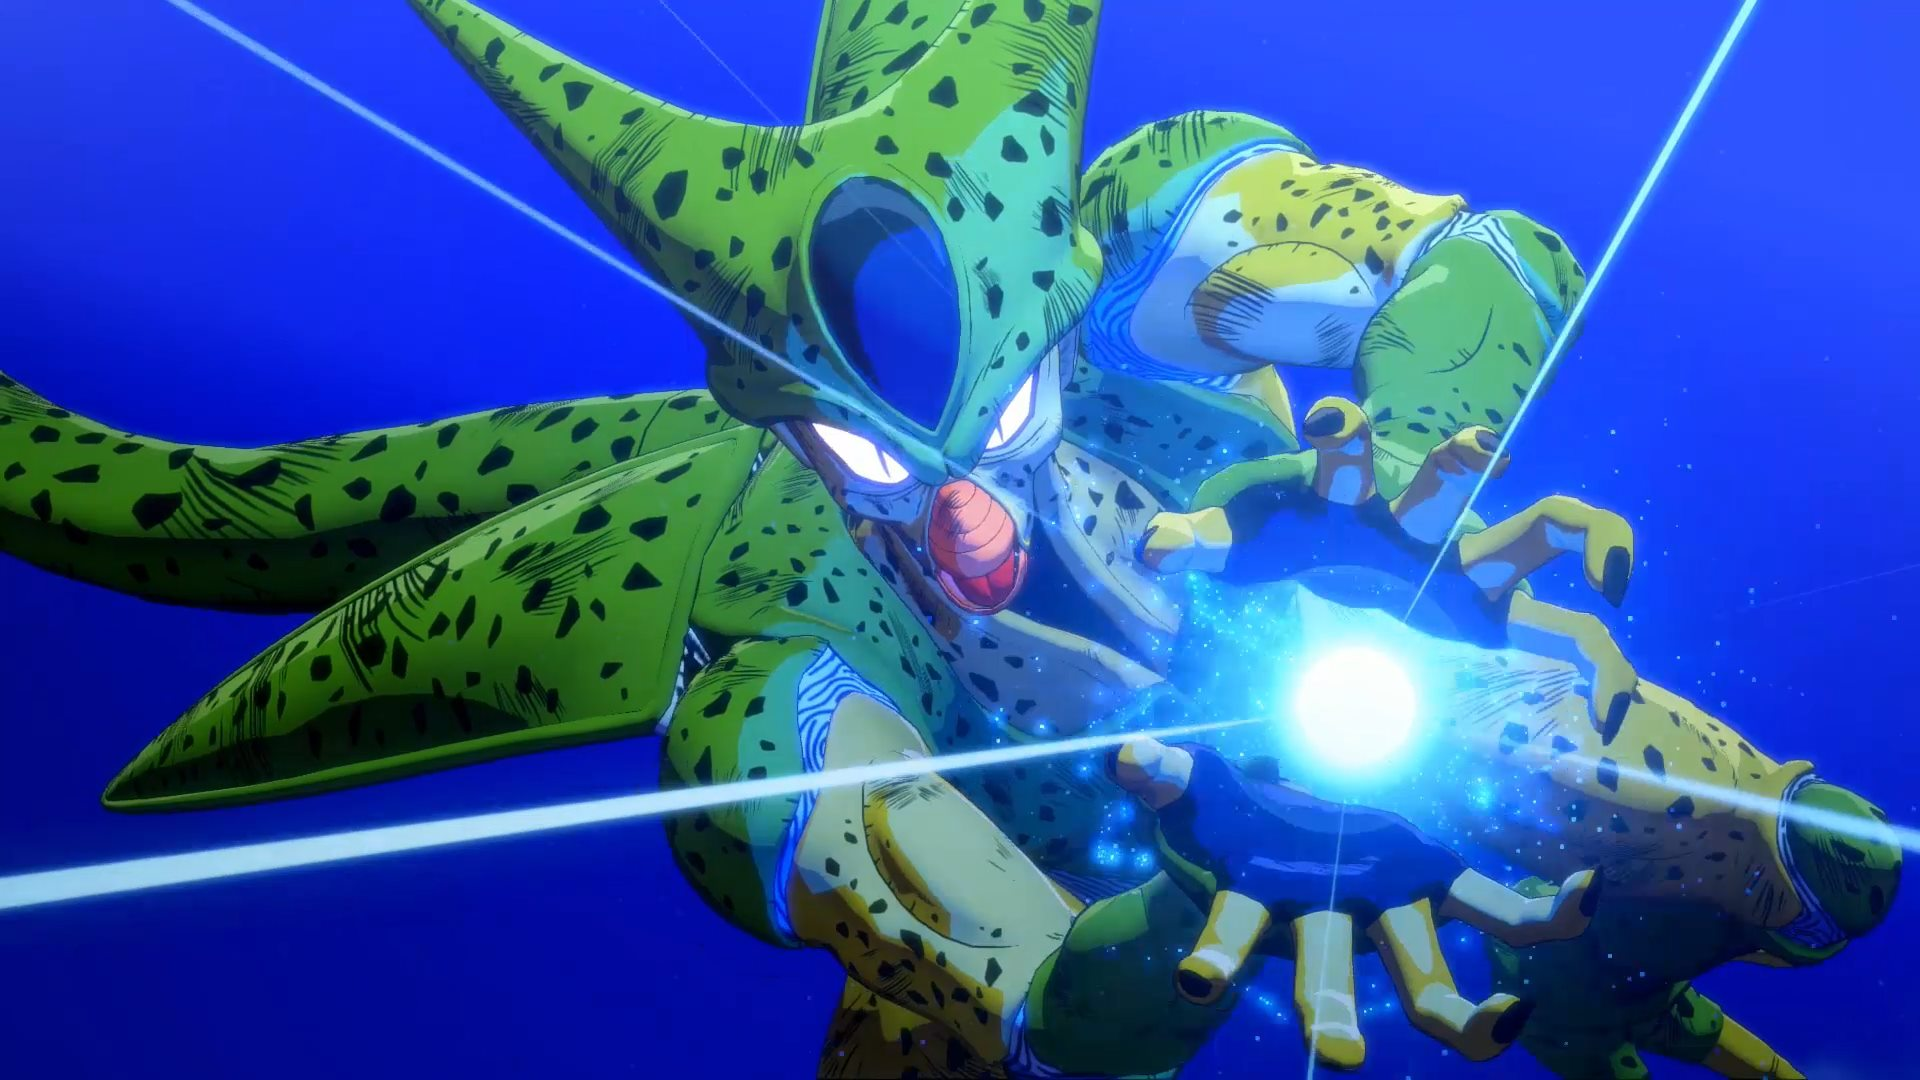 Imagme do vilão Cell no DLC de Dragon Ball Z: Kakarot